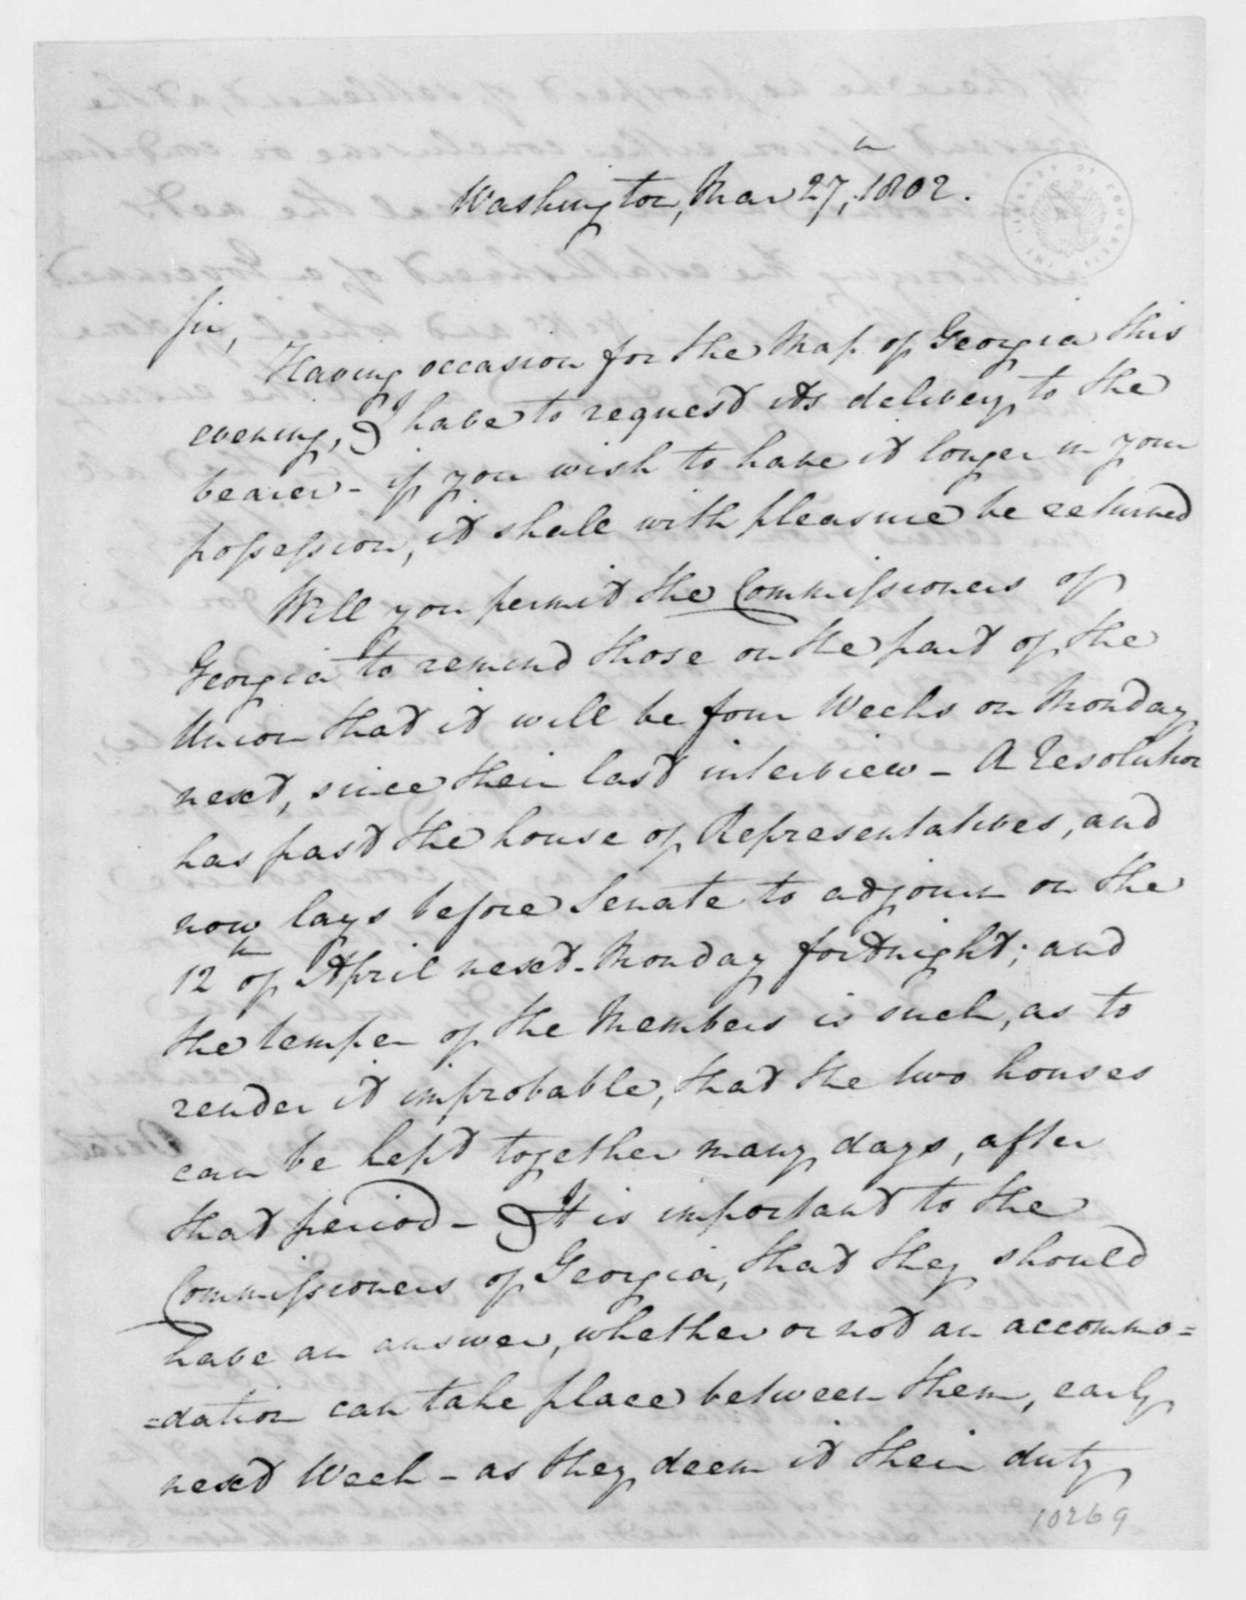 Jackson to Albert Gallatin, March 27, 1802.